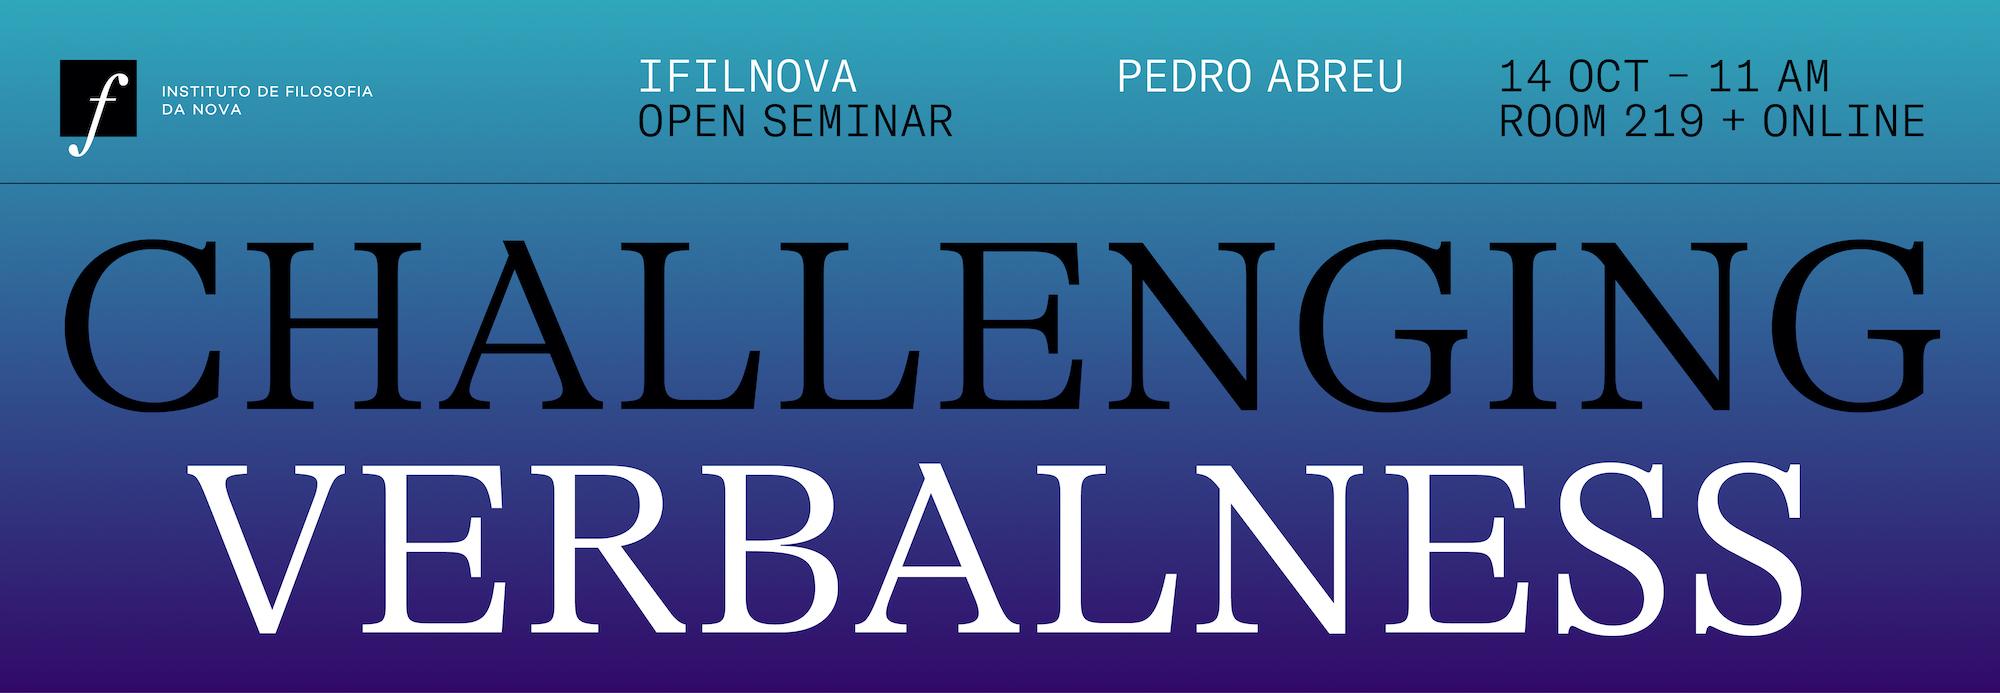 Challenging Verbalness banner 1